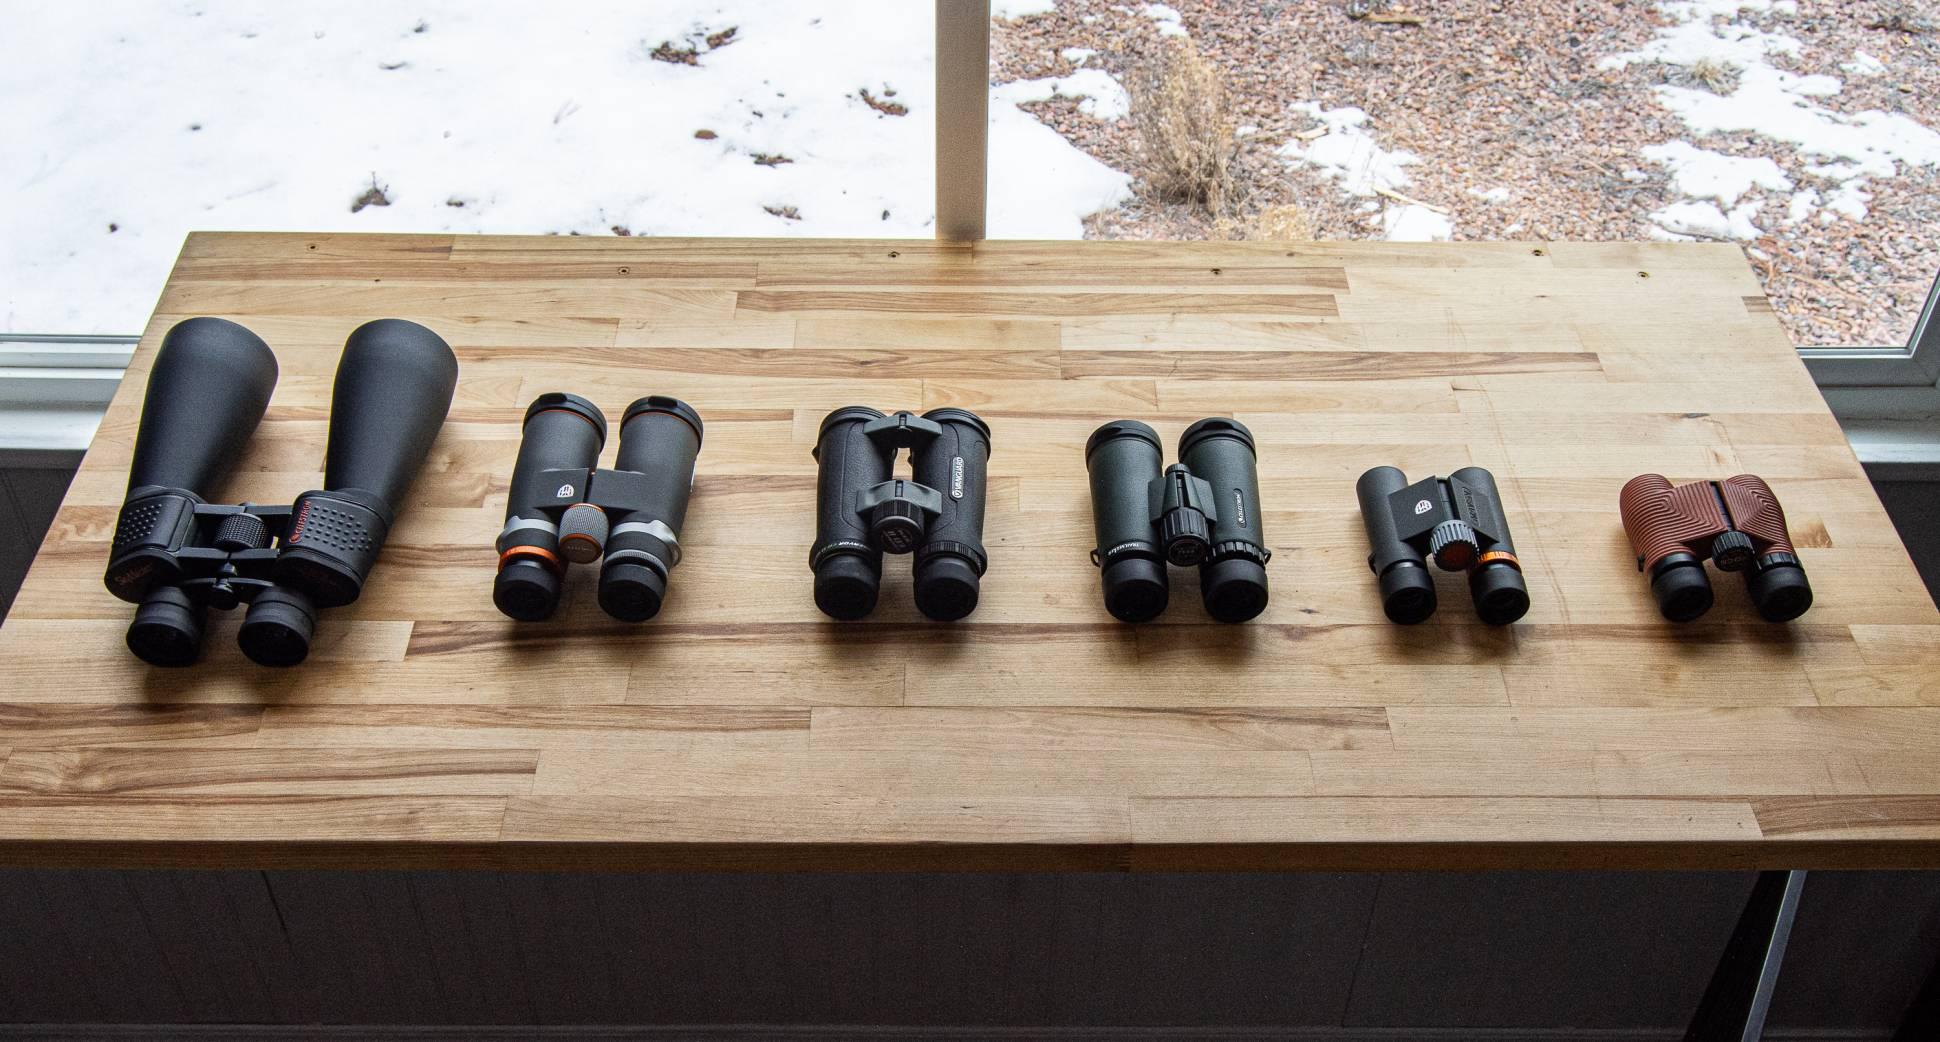 Comparing Binoculars